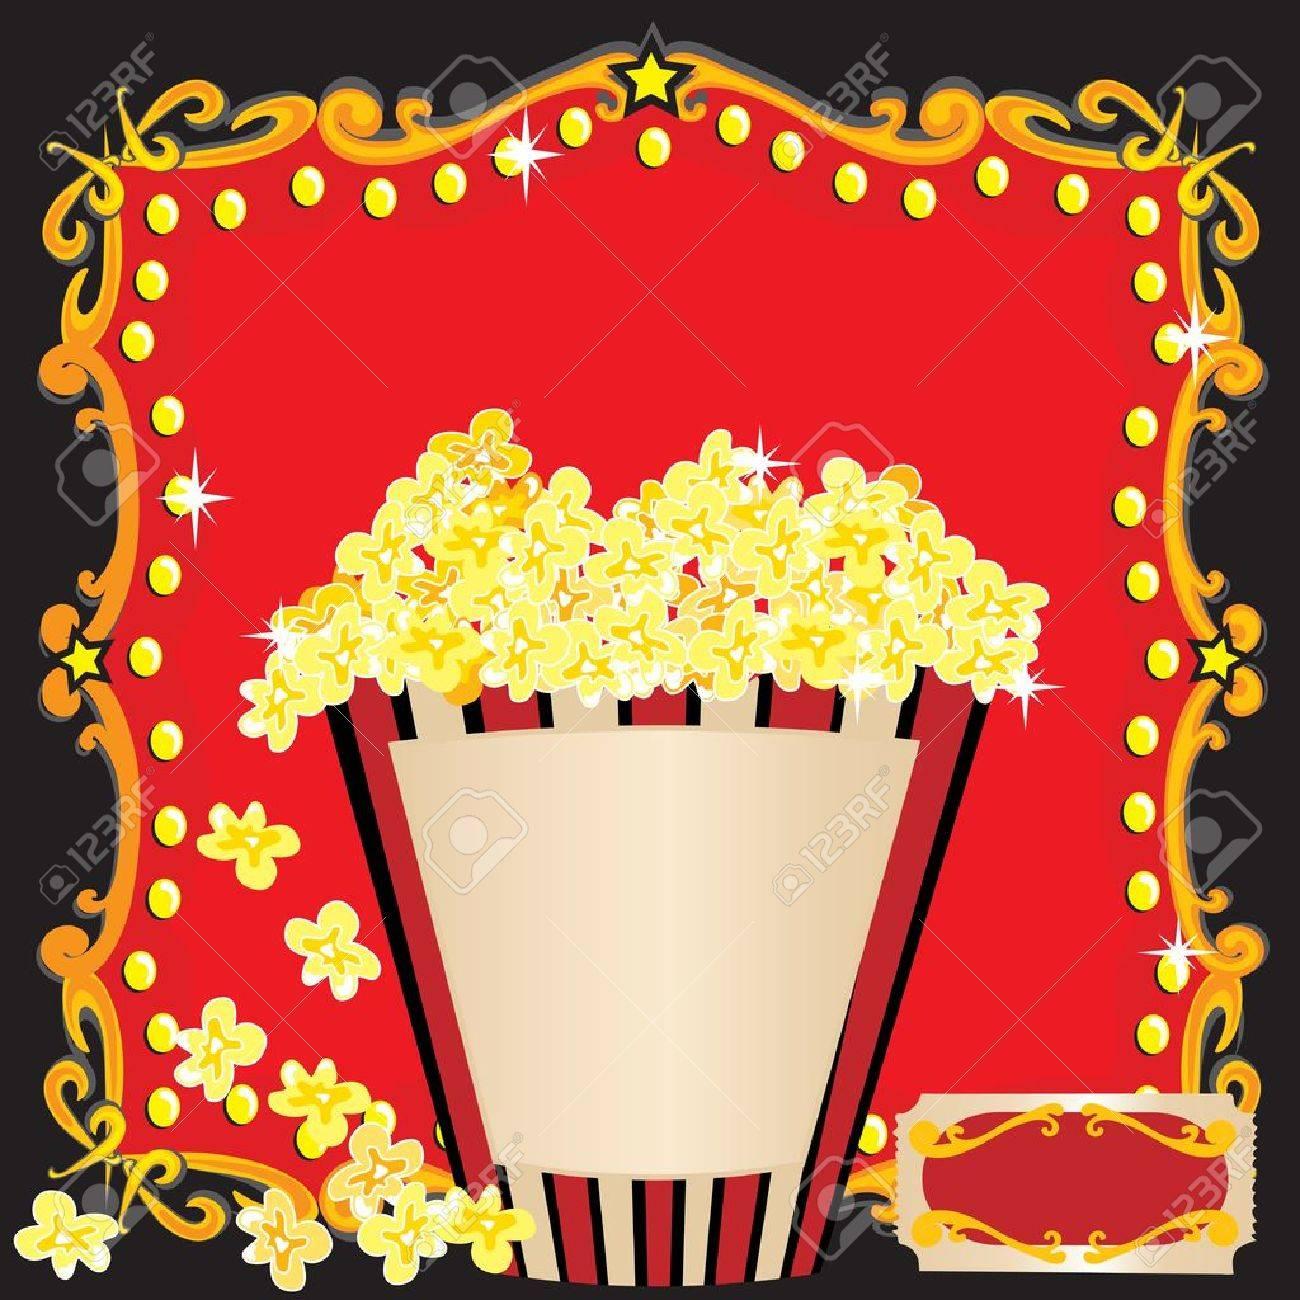 Popcorn And A Movie Birthday Party Invitation Royalty Free – Movie Themed Party Invitations